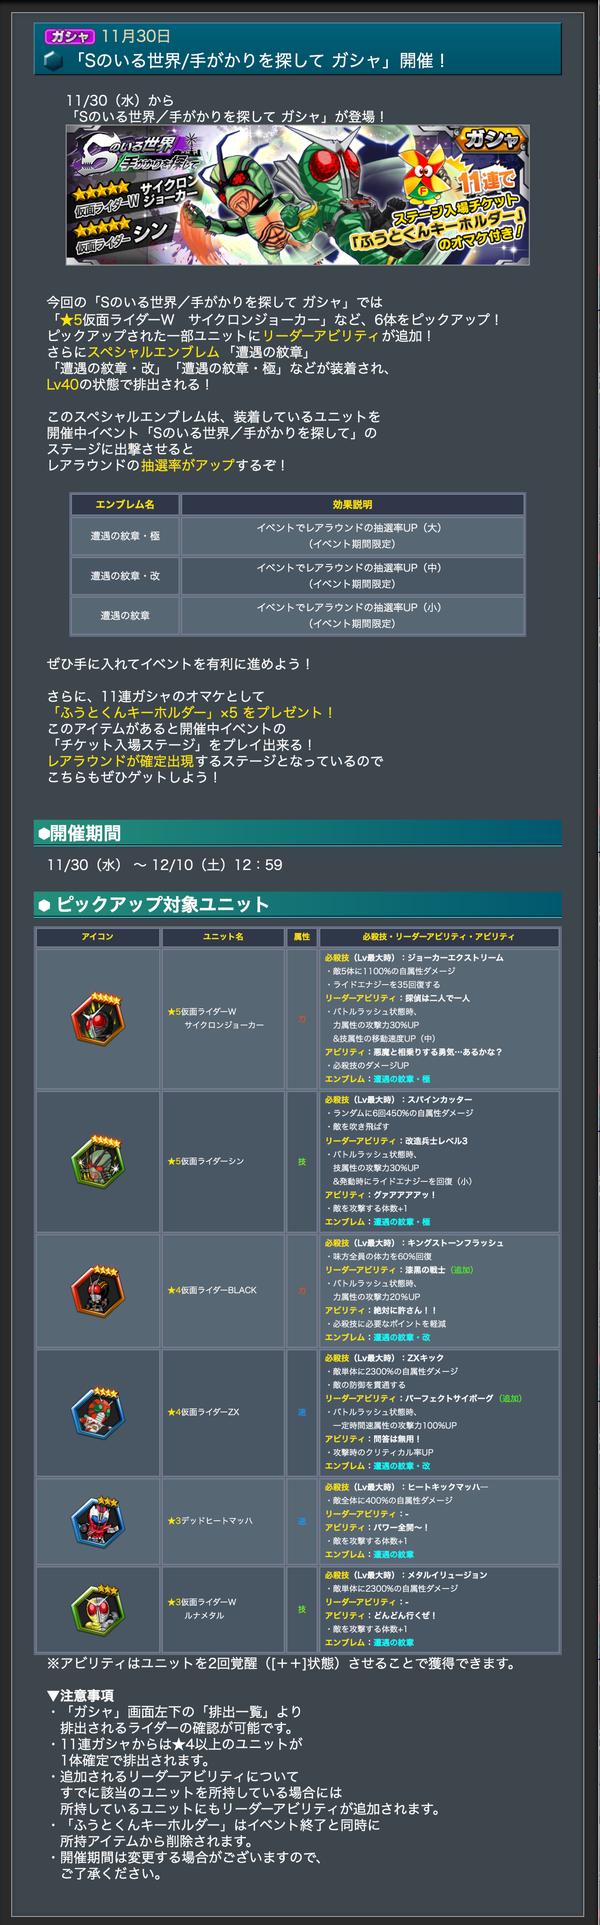 f:id:ich-ichi:20161201115736p:plain